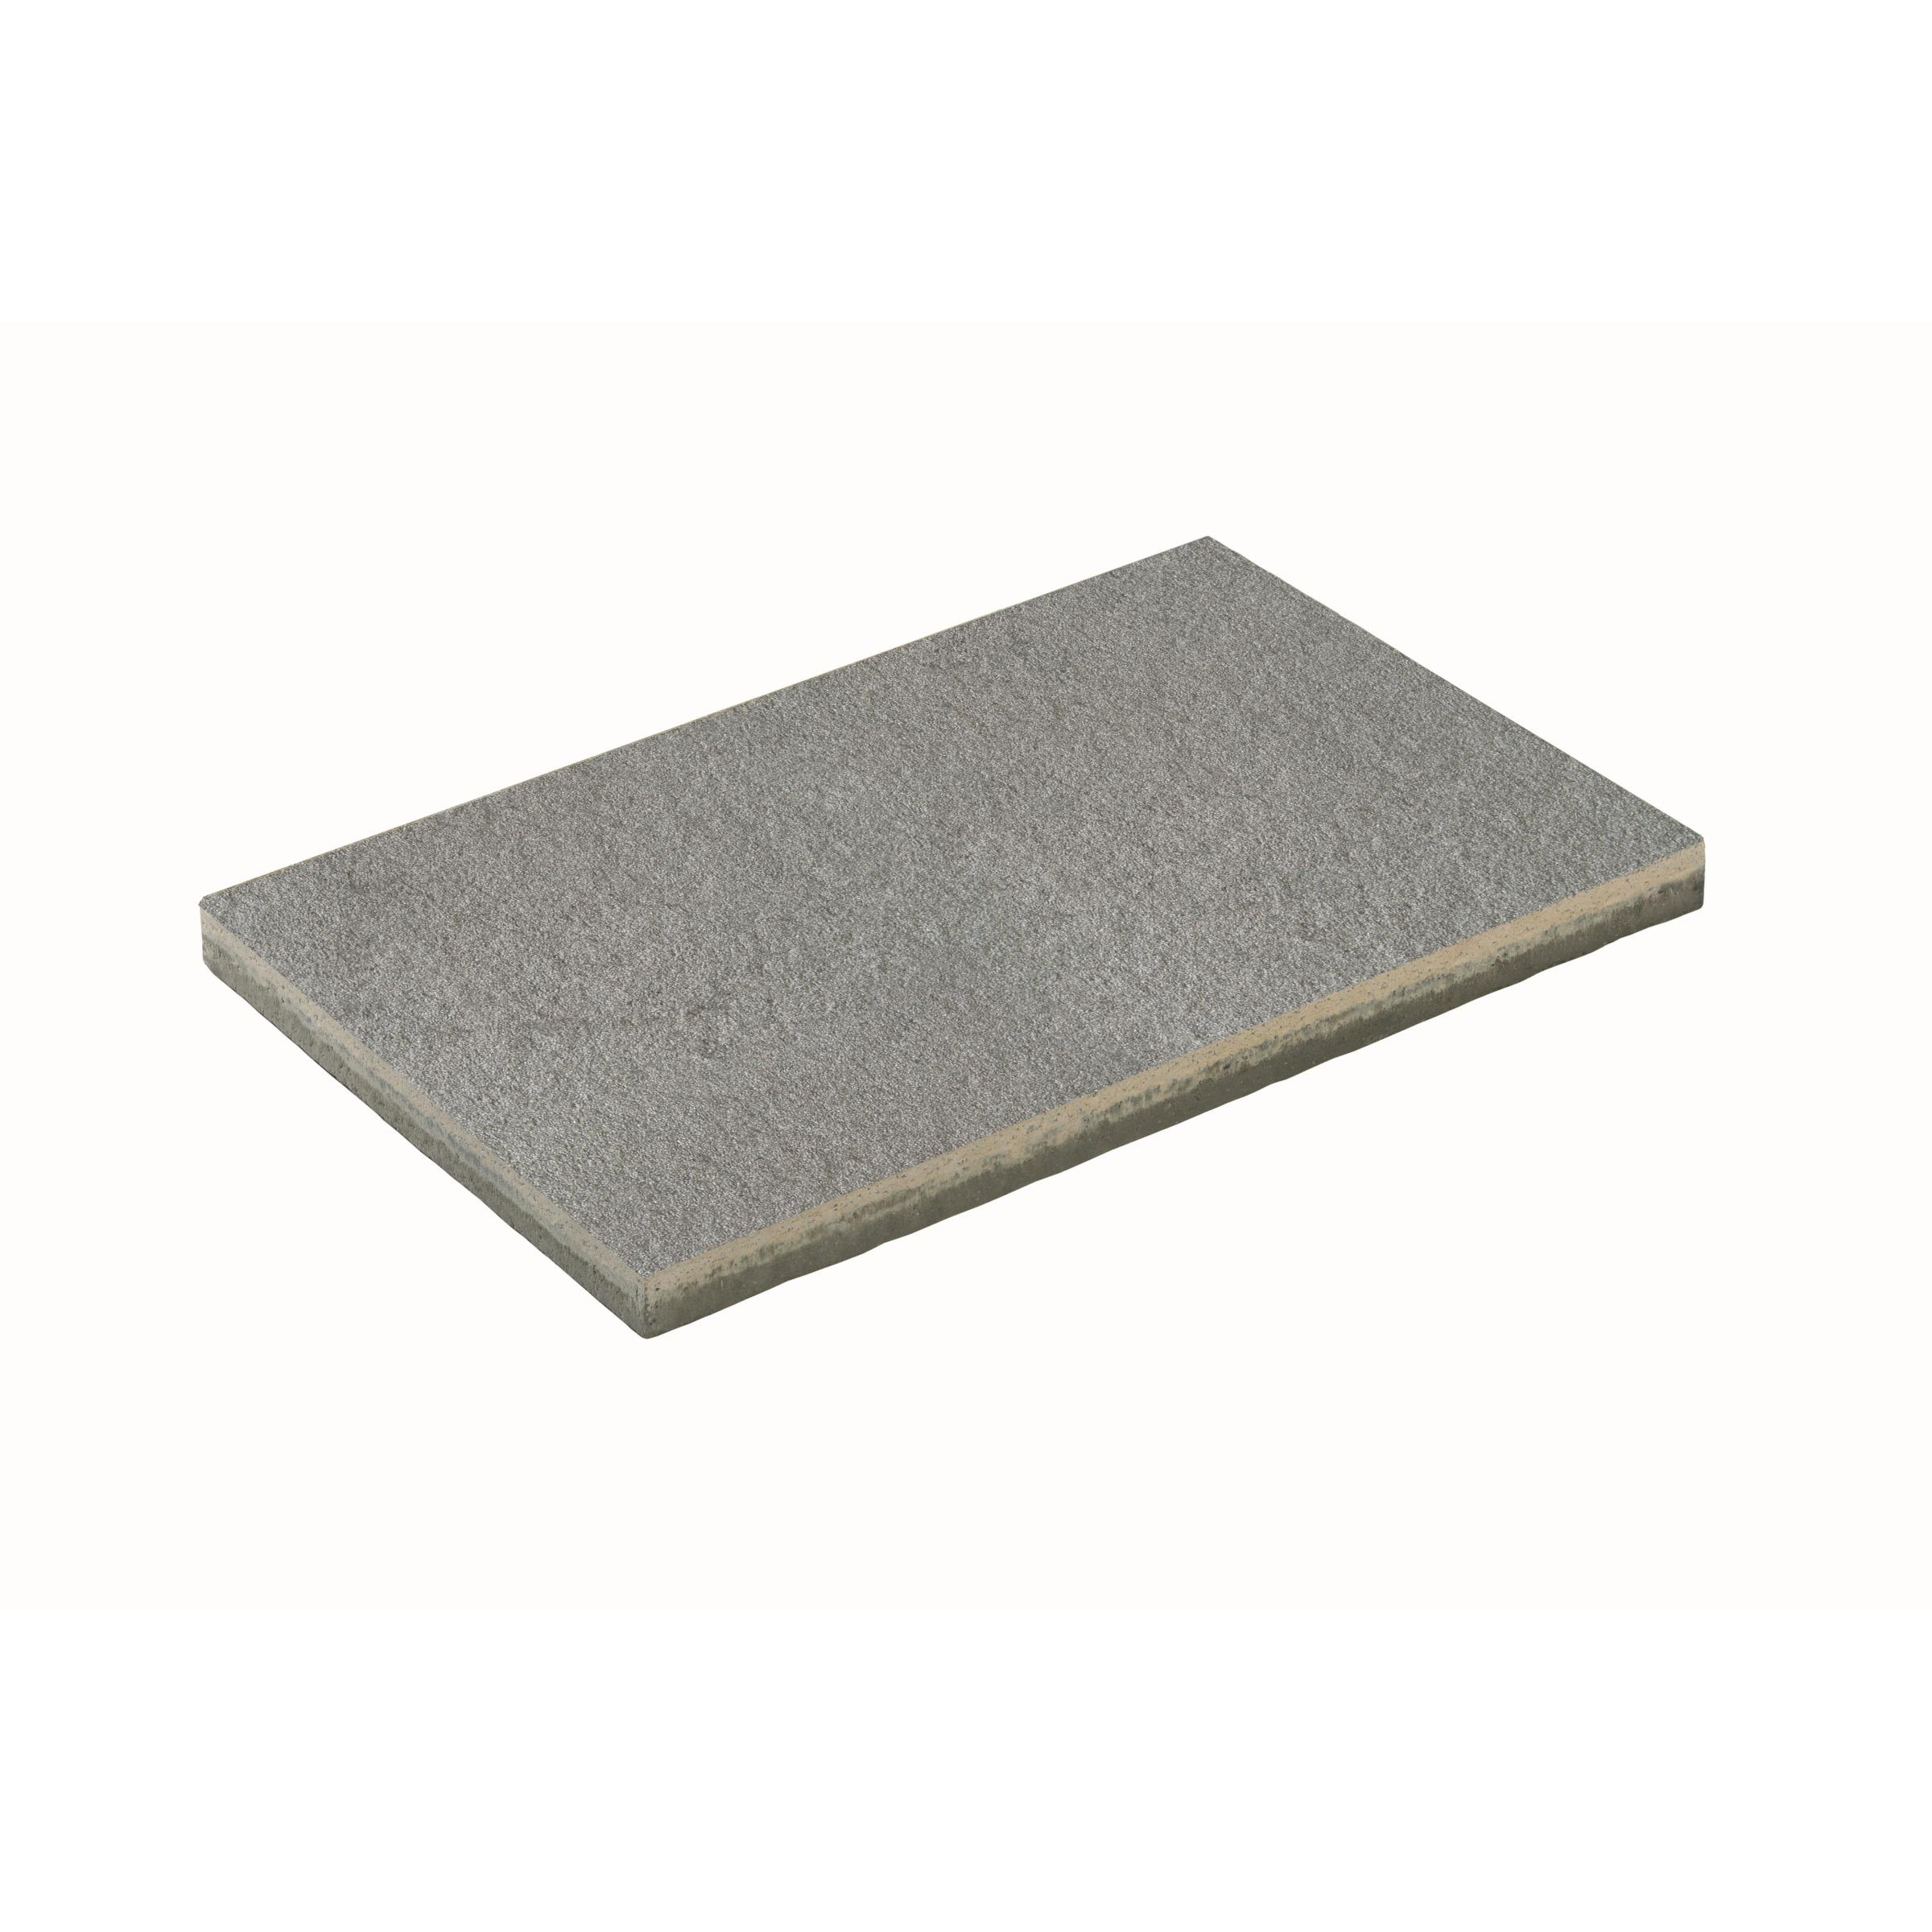 Terrastegel Beton Stuco Grijs 60x40 cm - 36 Tegels - 8,64 m2